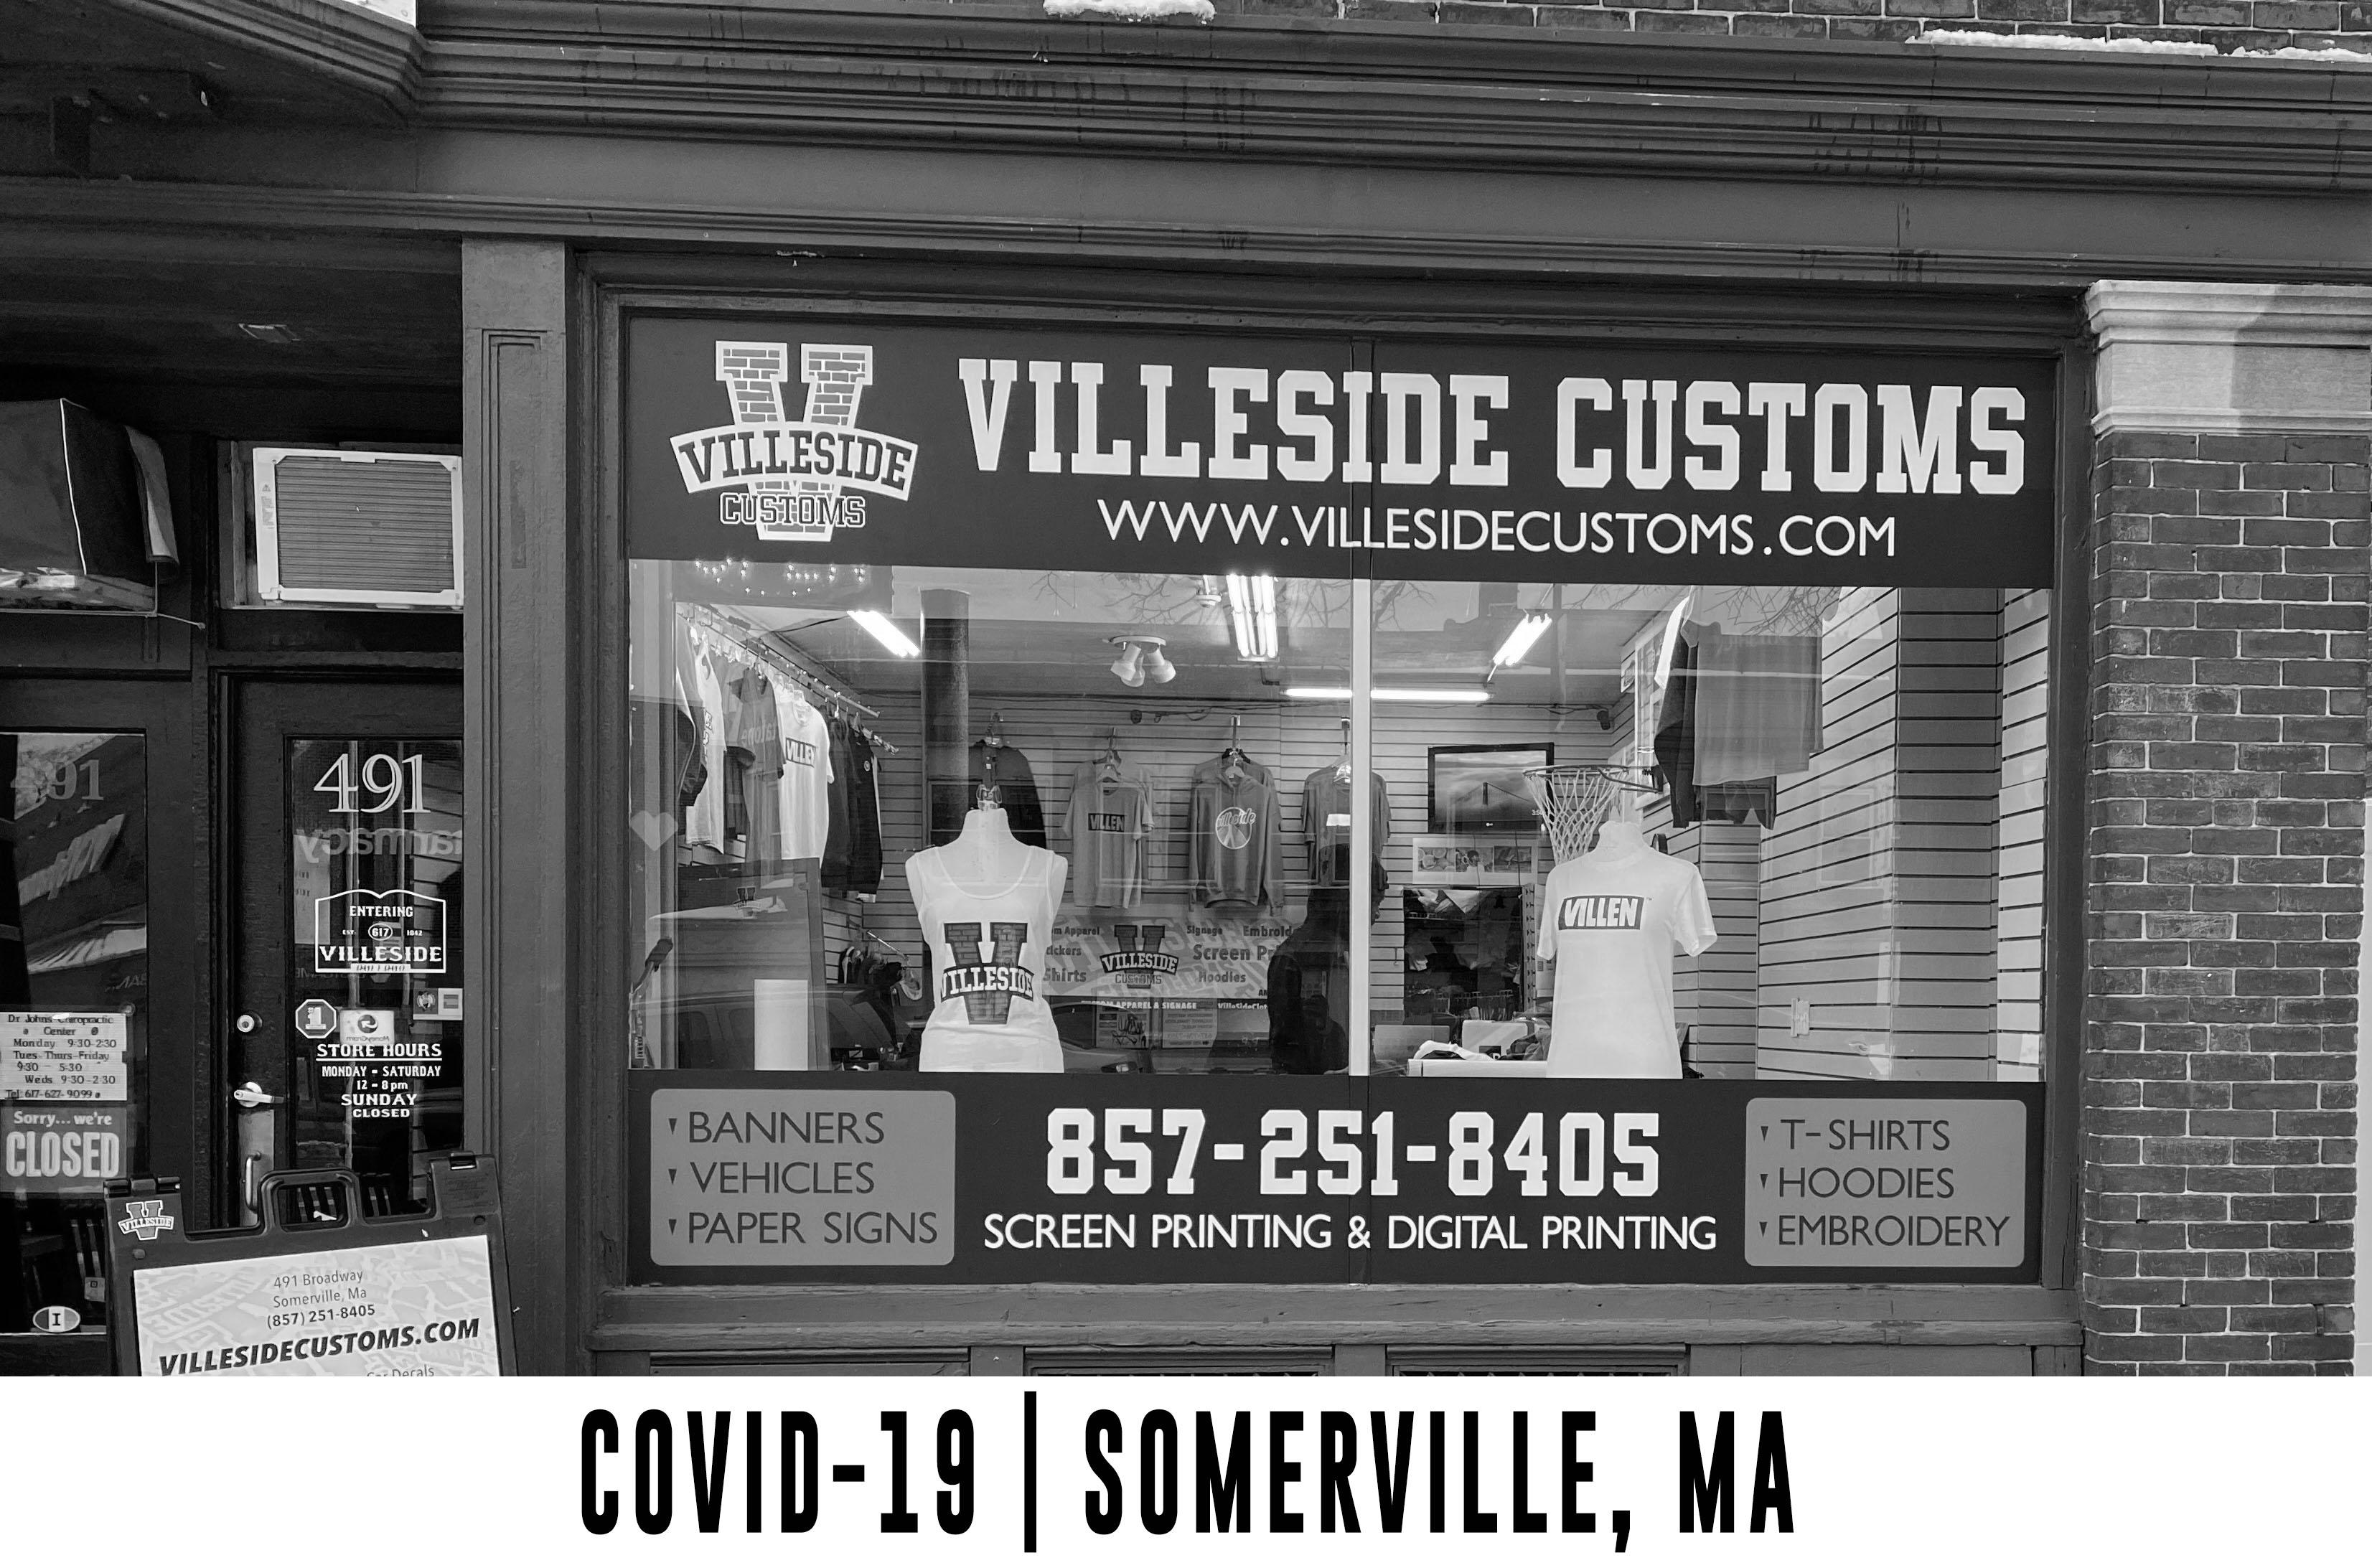 COVID-19 in Somerville at Villeside Customs